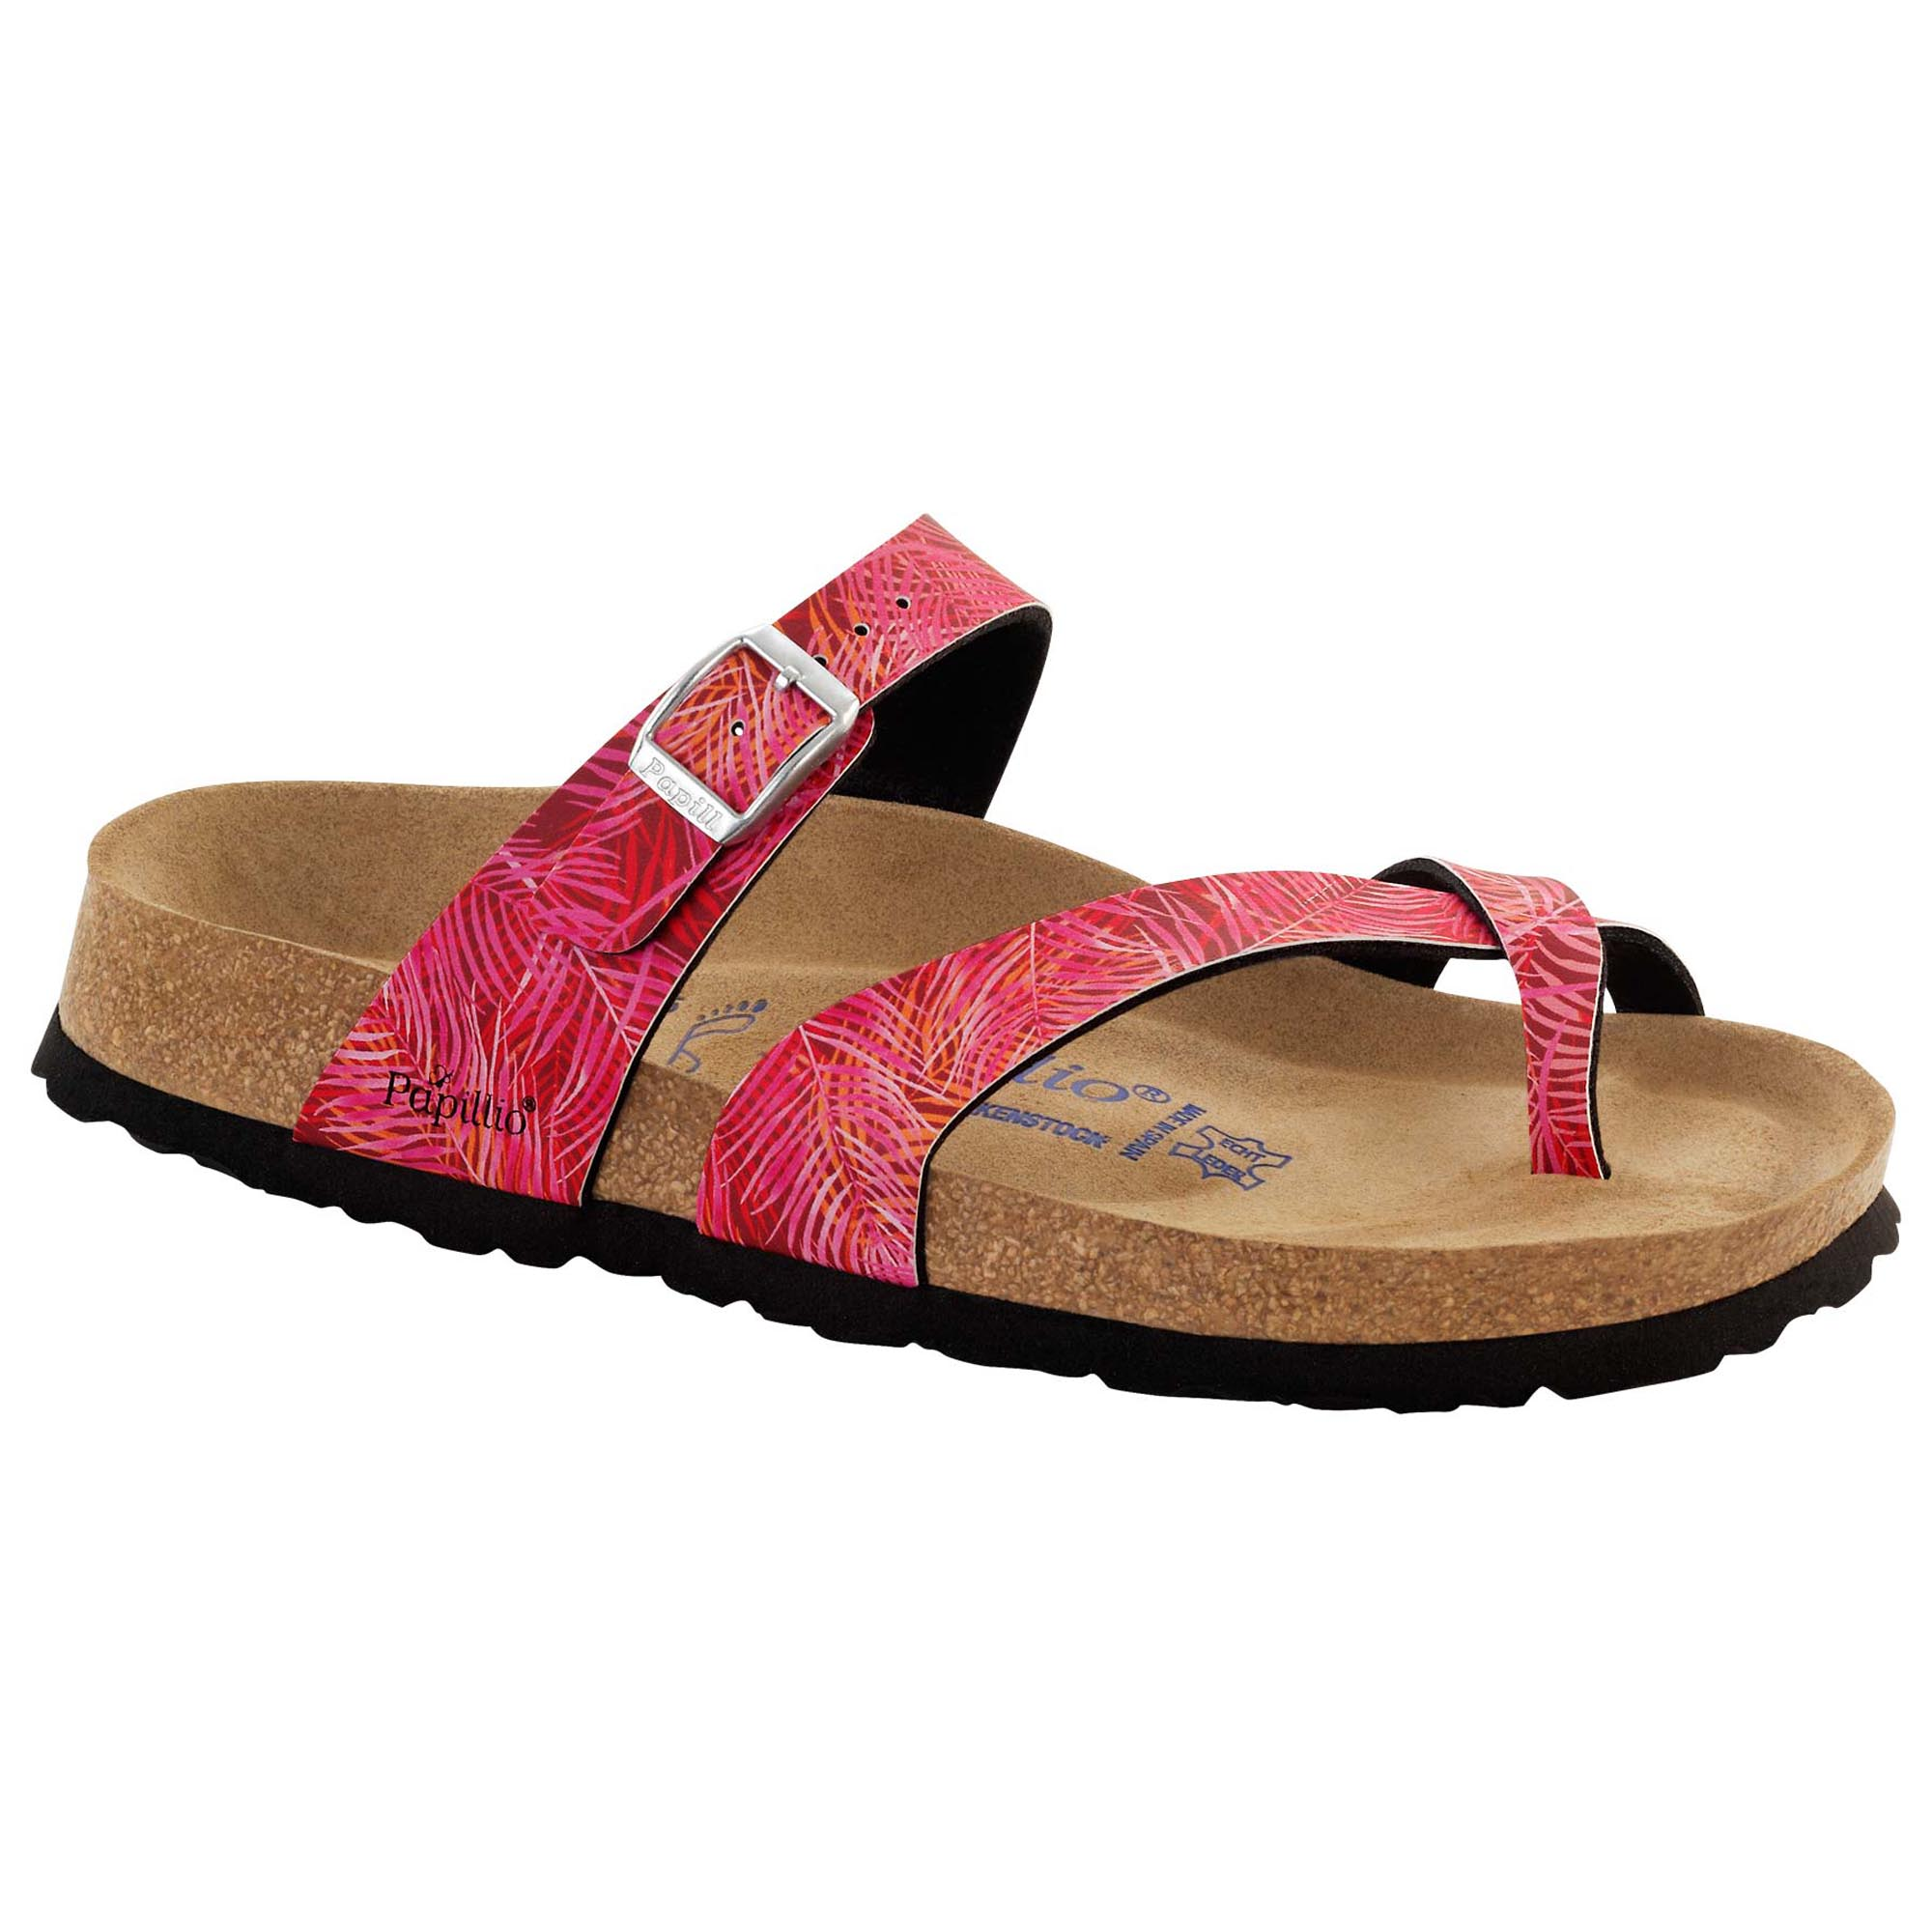 b5e7c873e2bb Tabora Birko-Flor Tropical Leaf Pink